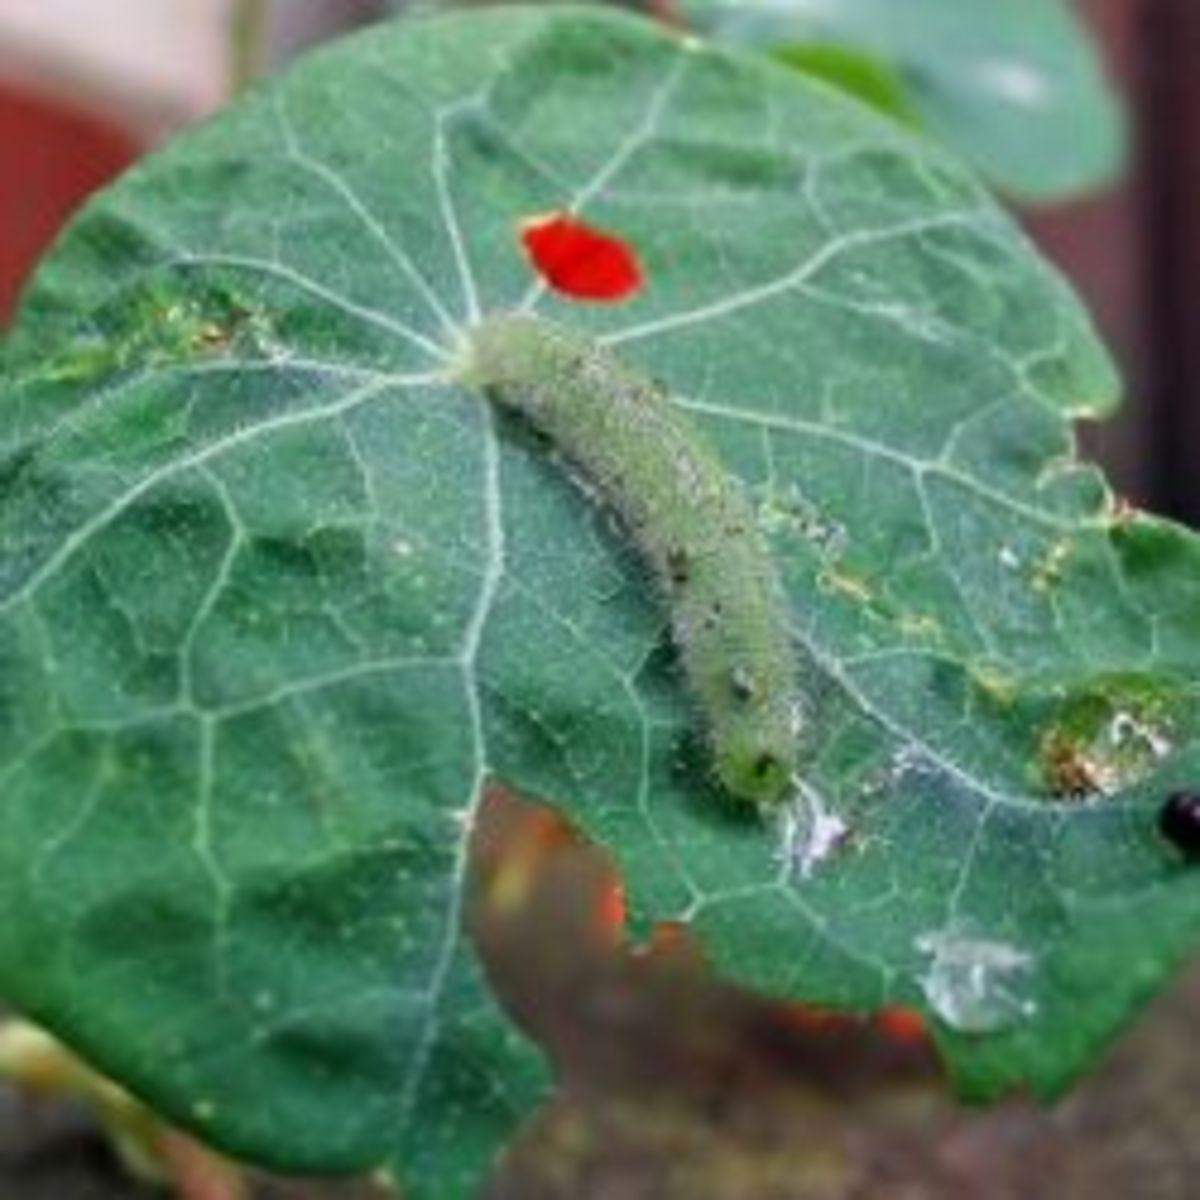 A caterpillar of Pieris rapae